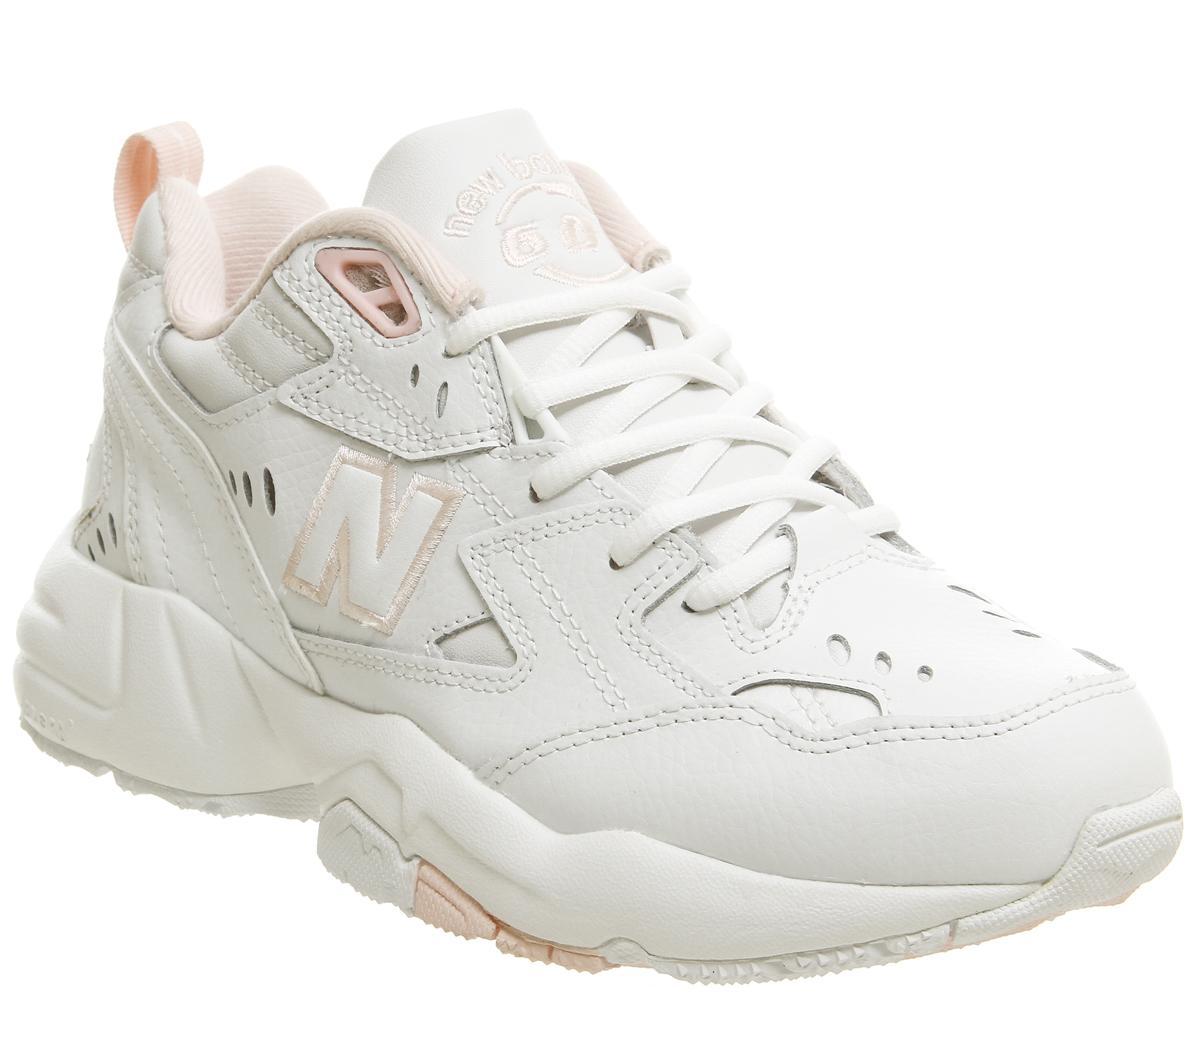 New Balance 608 Trainers Cream Pink